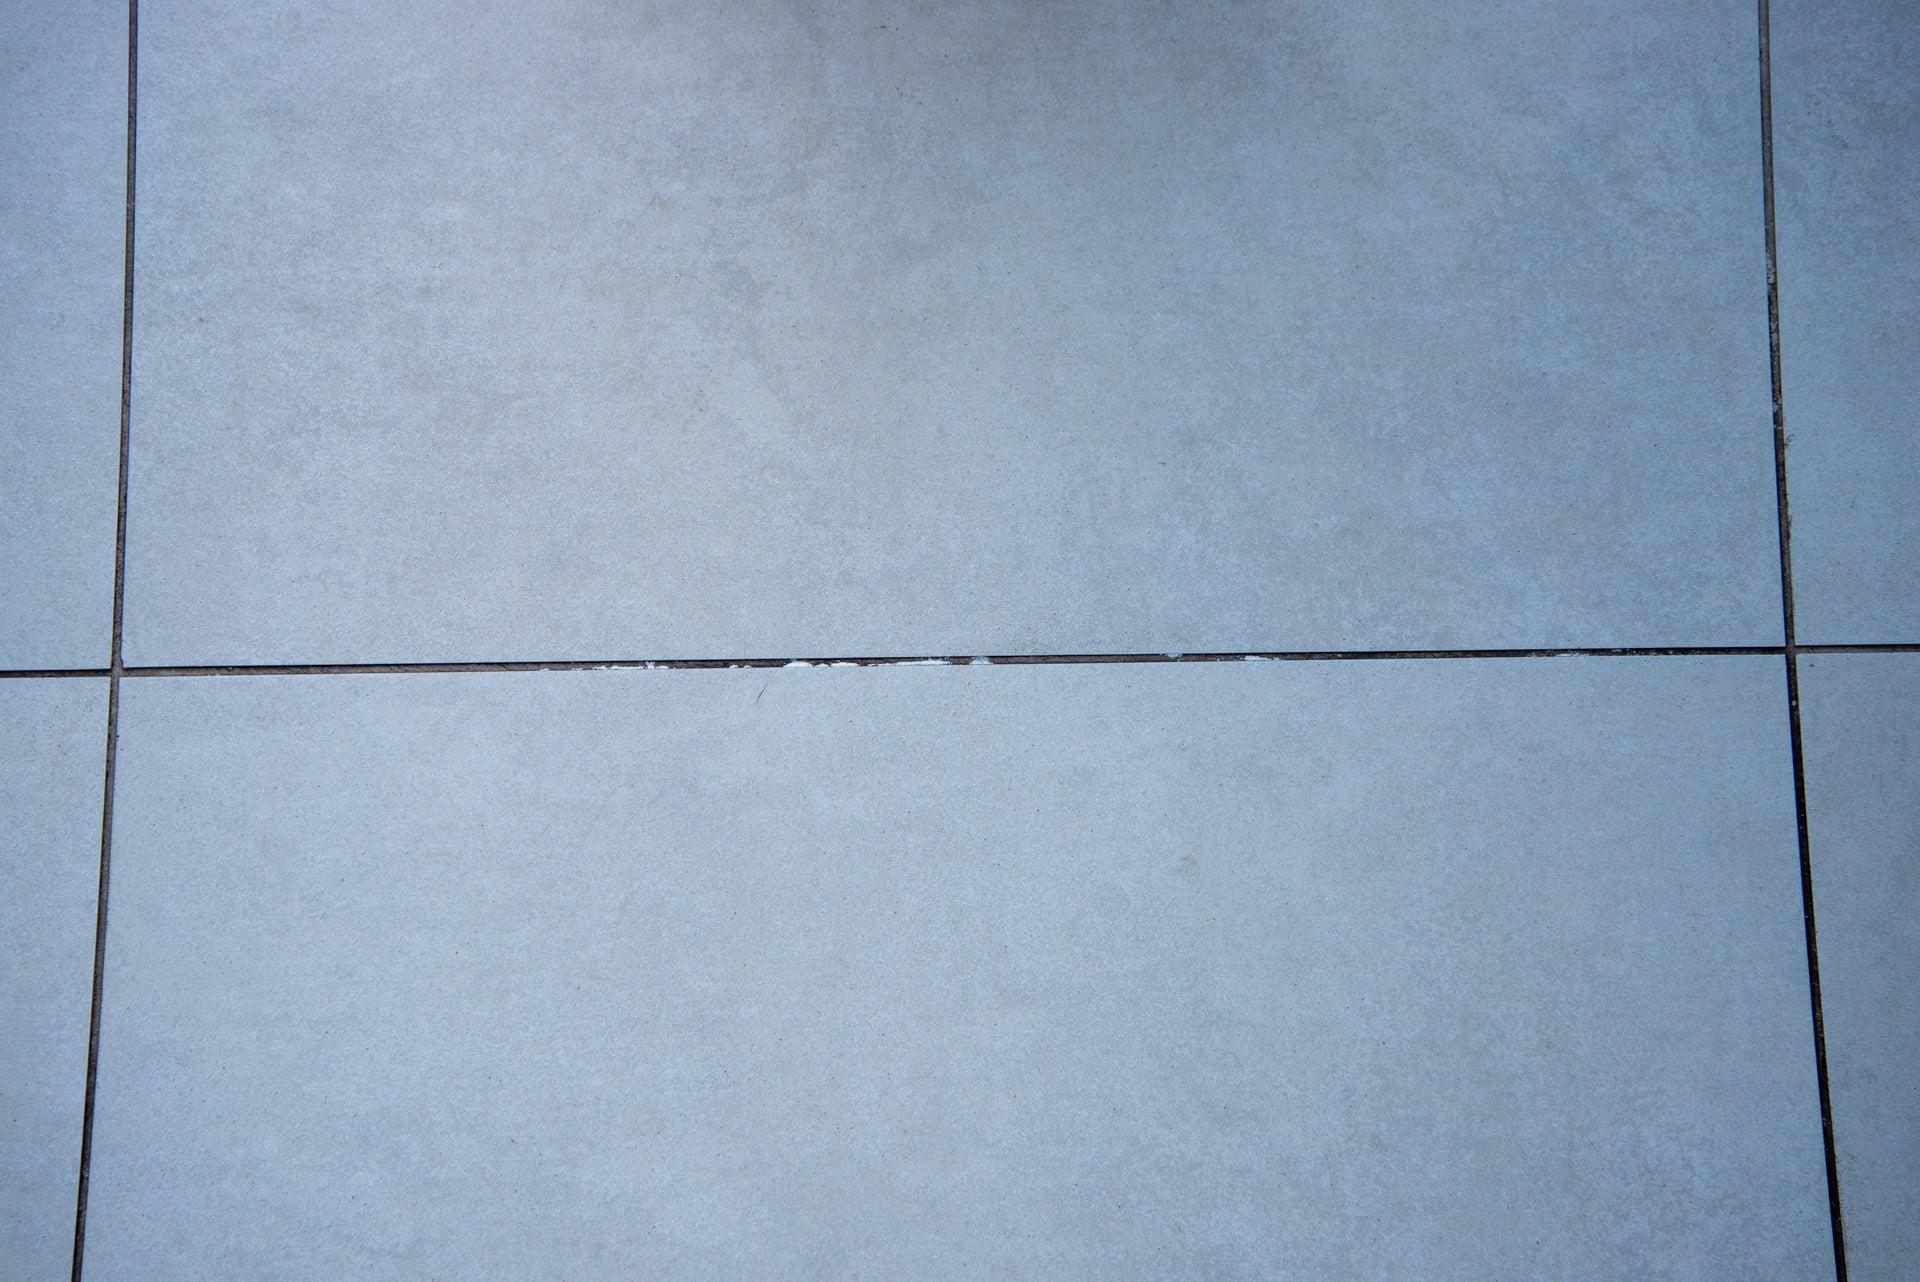 Roborock S7 чистый твердый пол